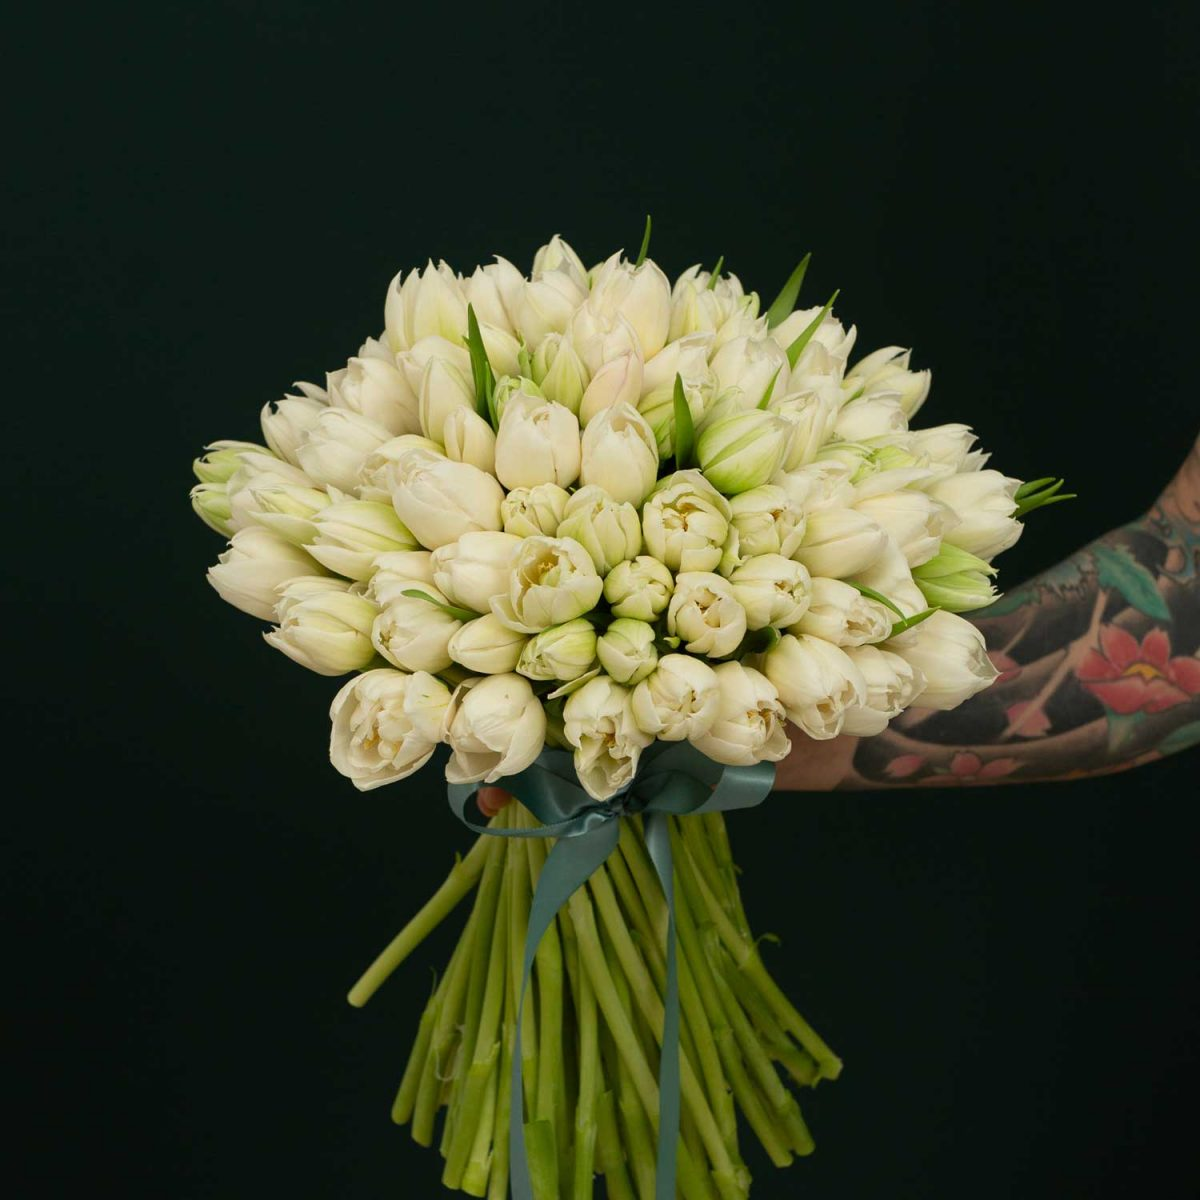 buchet-de-lalele-albe-tulip-fantasy-maison-dadoo-1500×1500-2-1-1200×1200